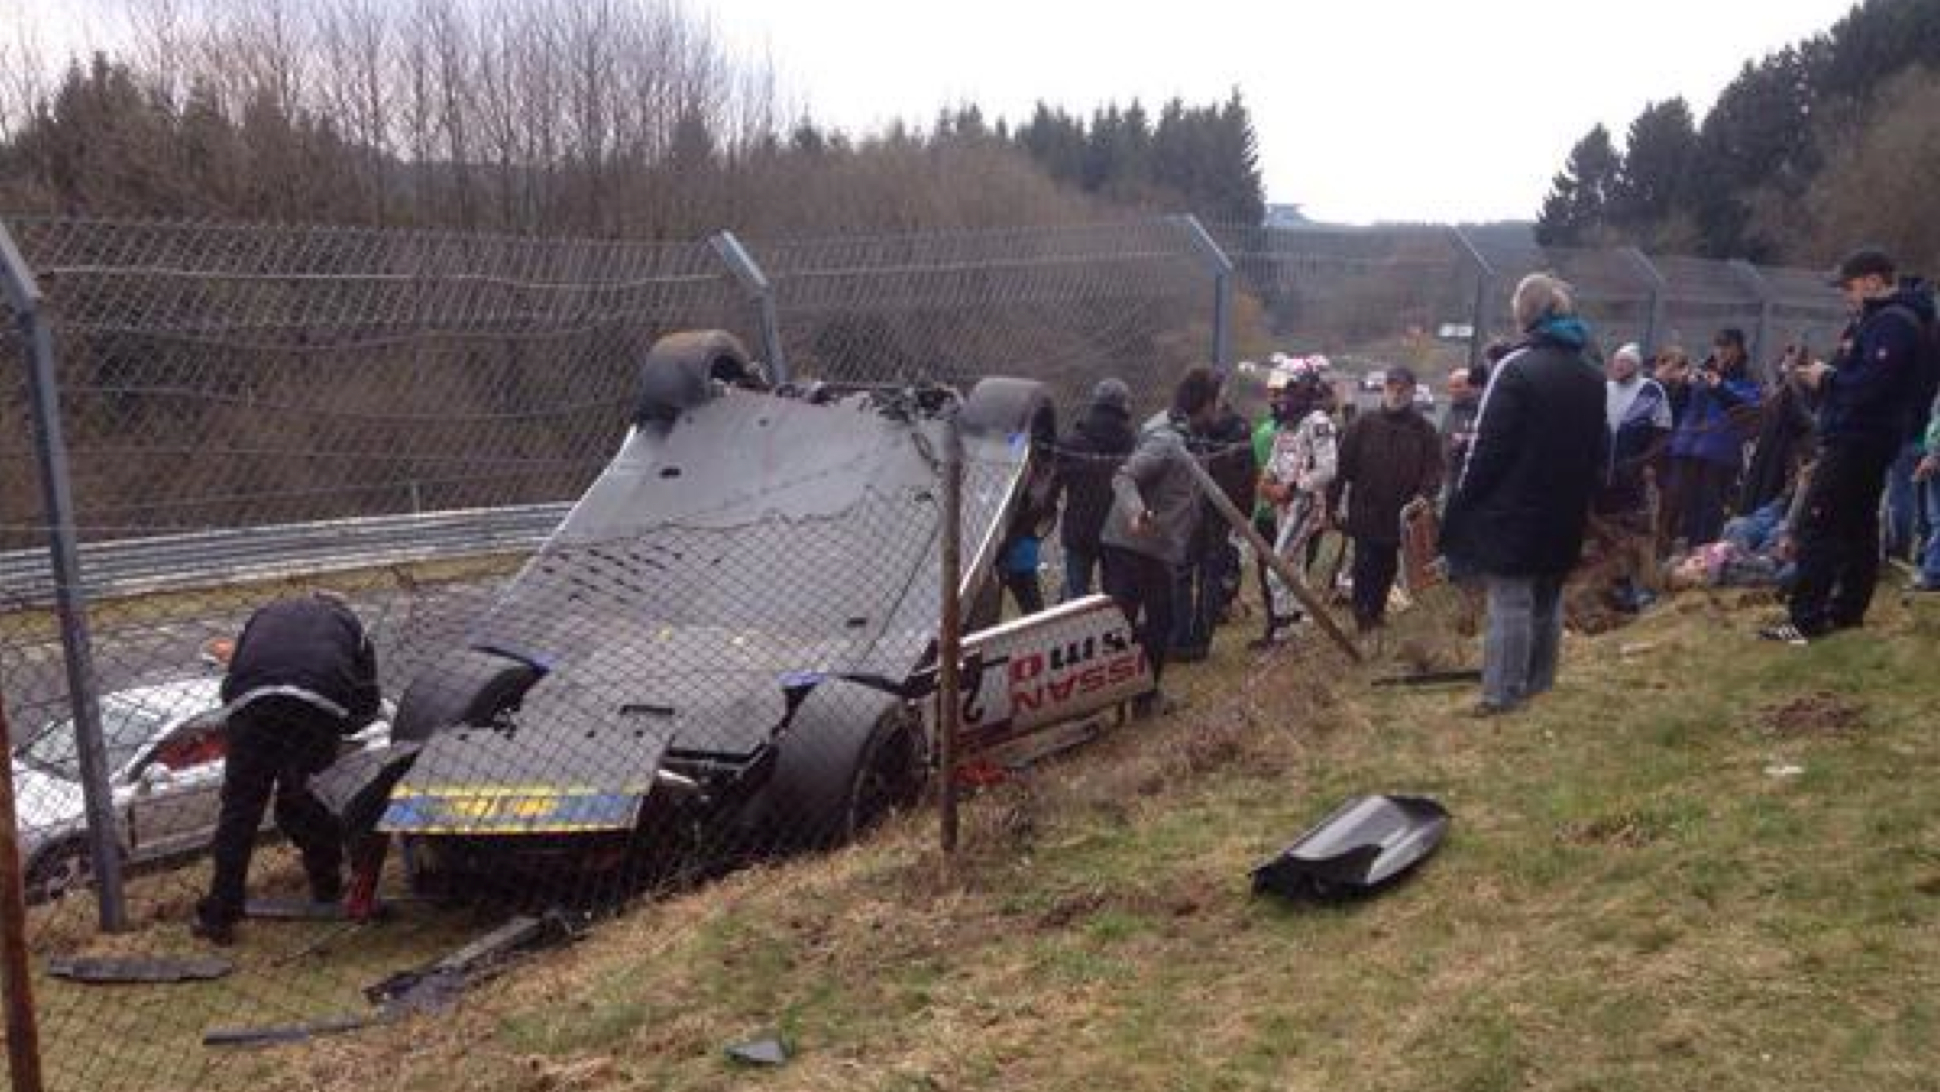 Jann Mardenborough - Nurburgring Crash